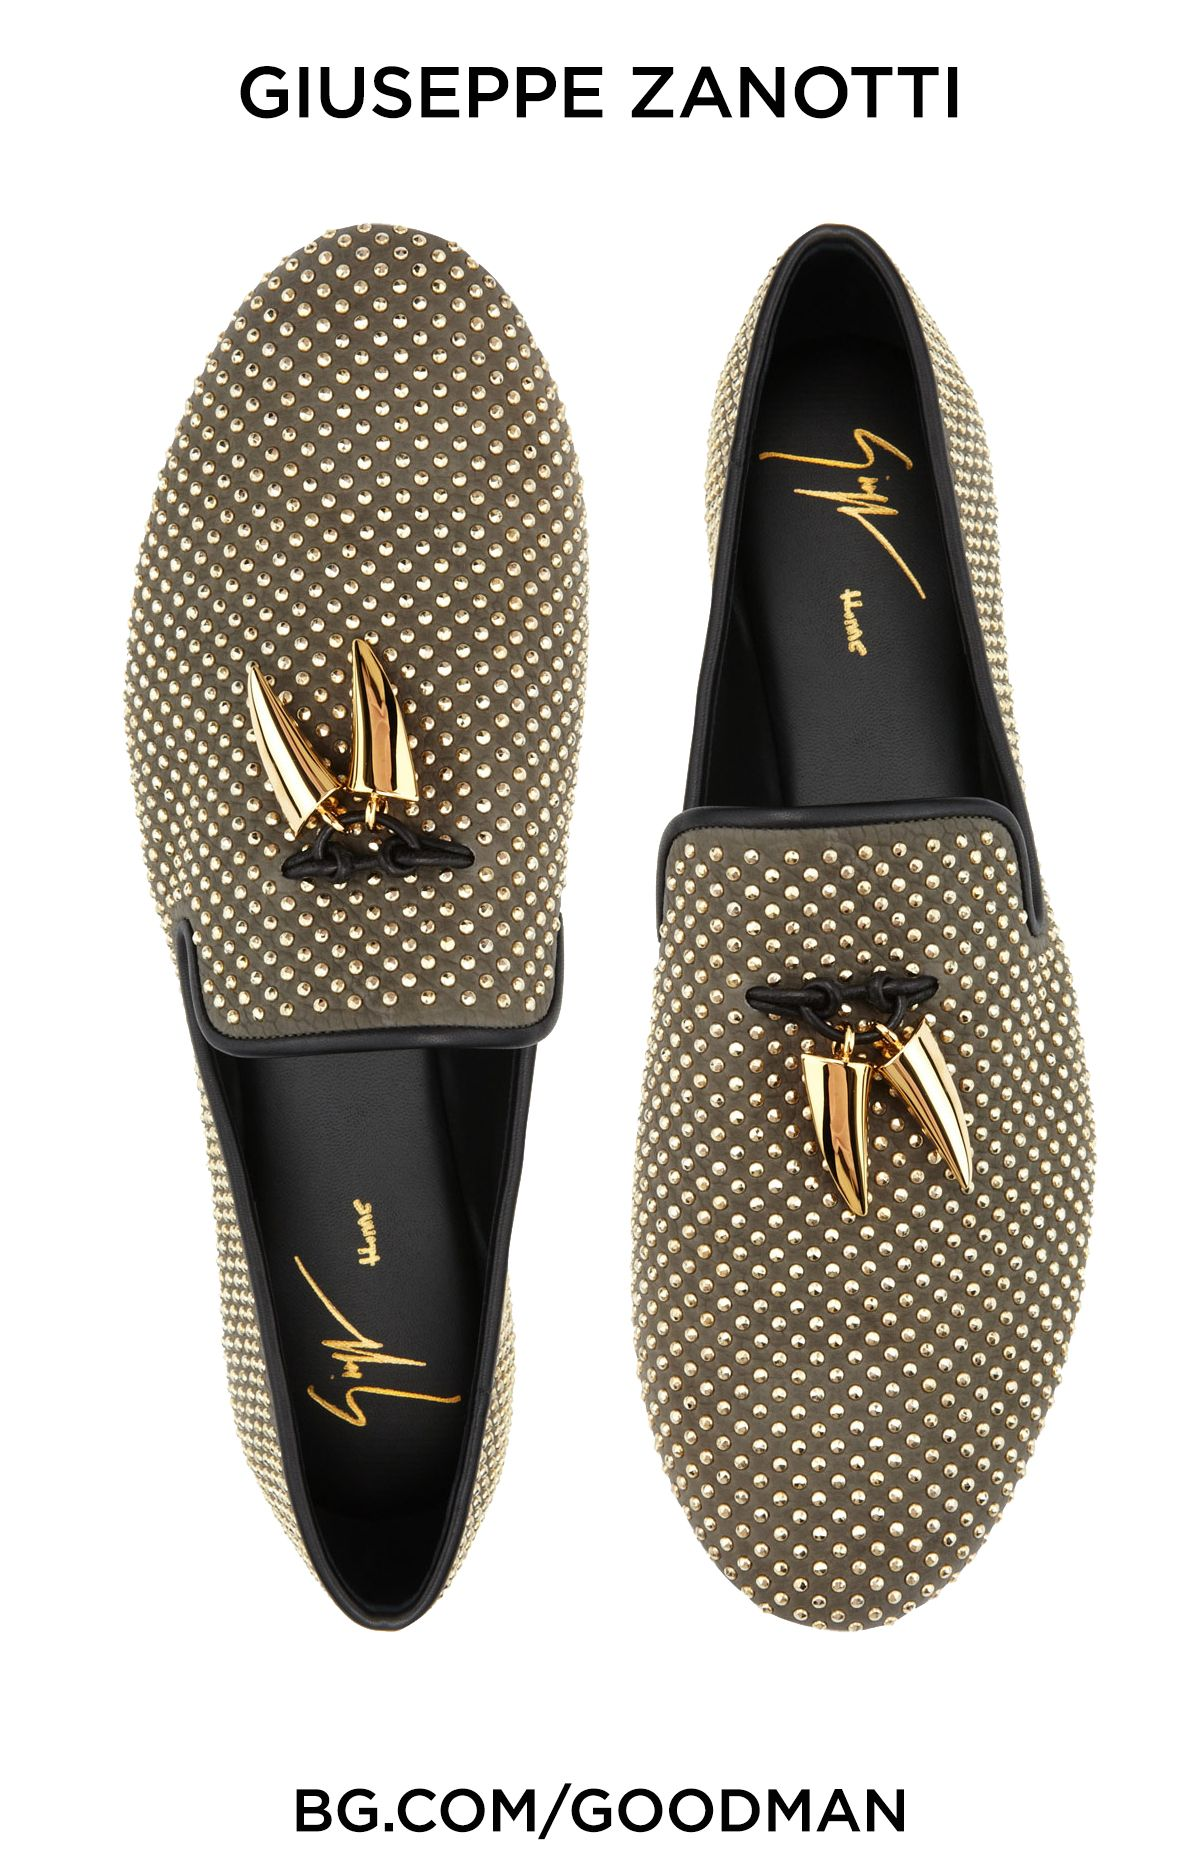 Giuseppe Zanotti Mens Studded Toggle Slipper Vaky Kaky Dress Shoes Men Gentleman Shoes Studs Men [ 1860 x 1200 Pixel ]